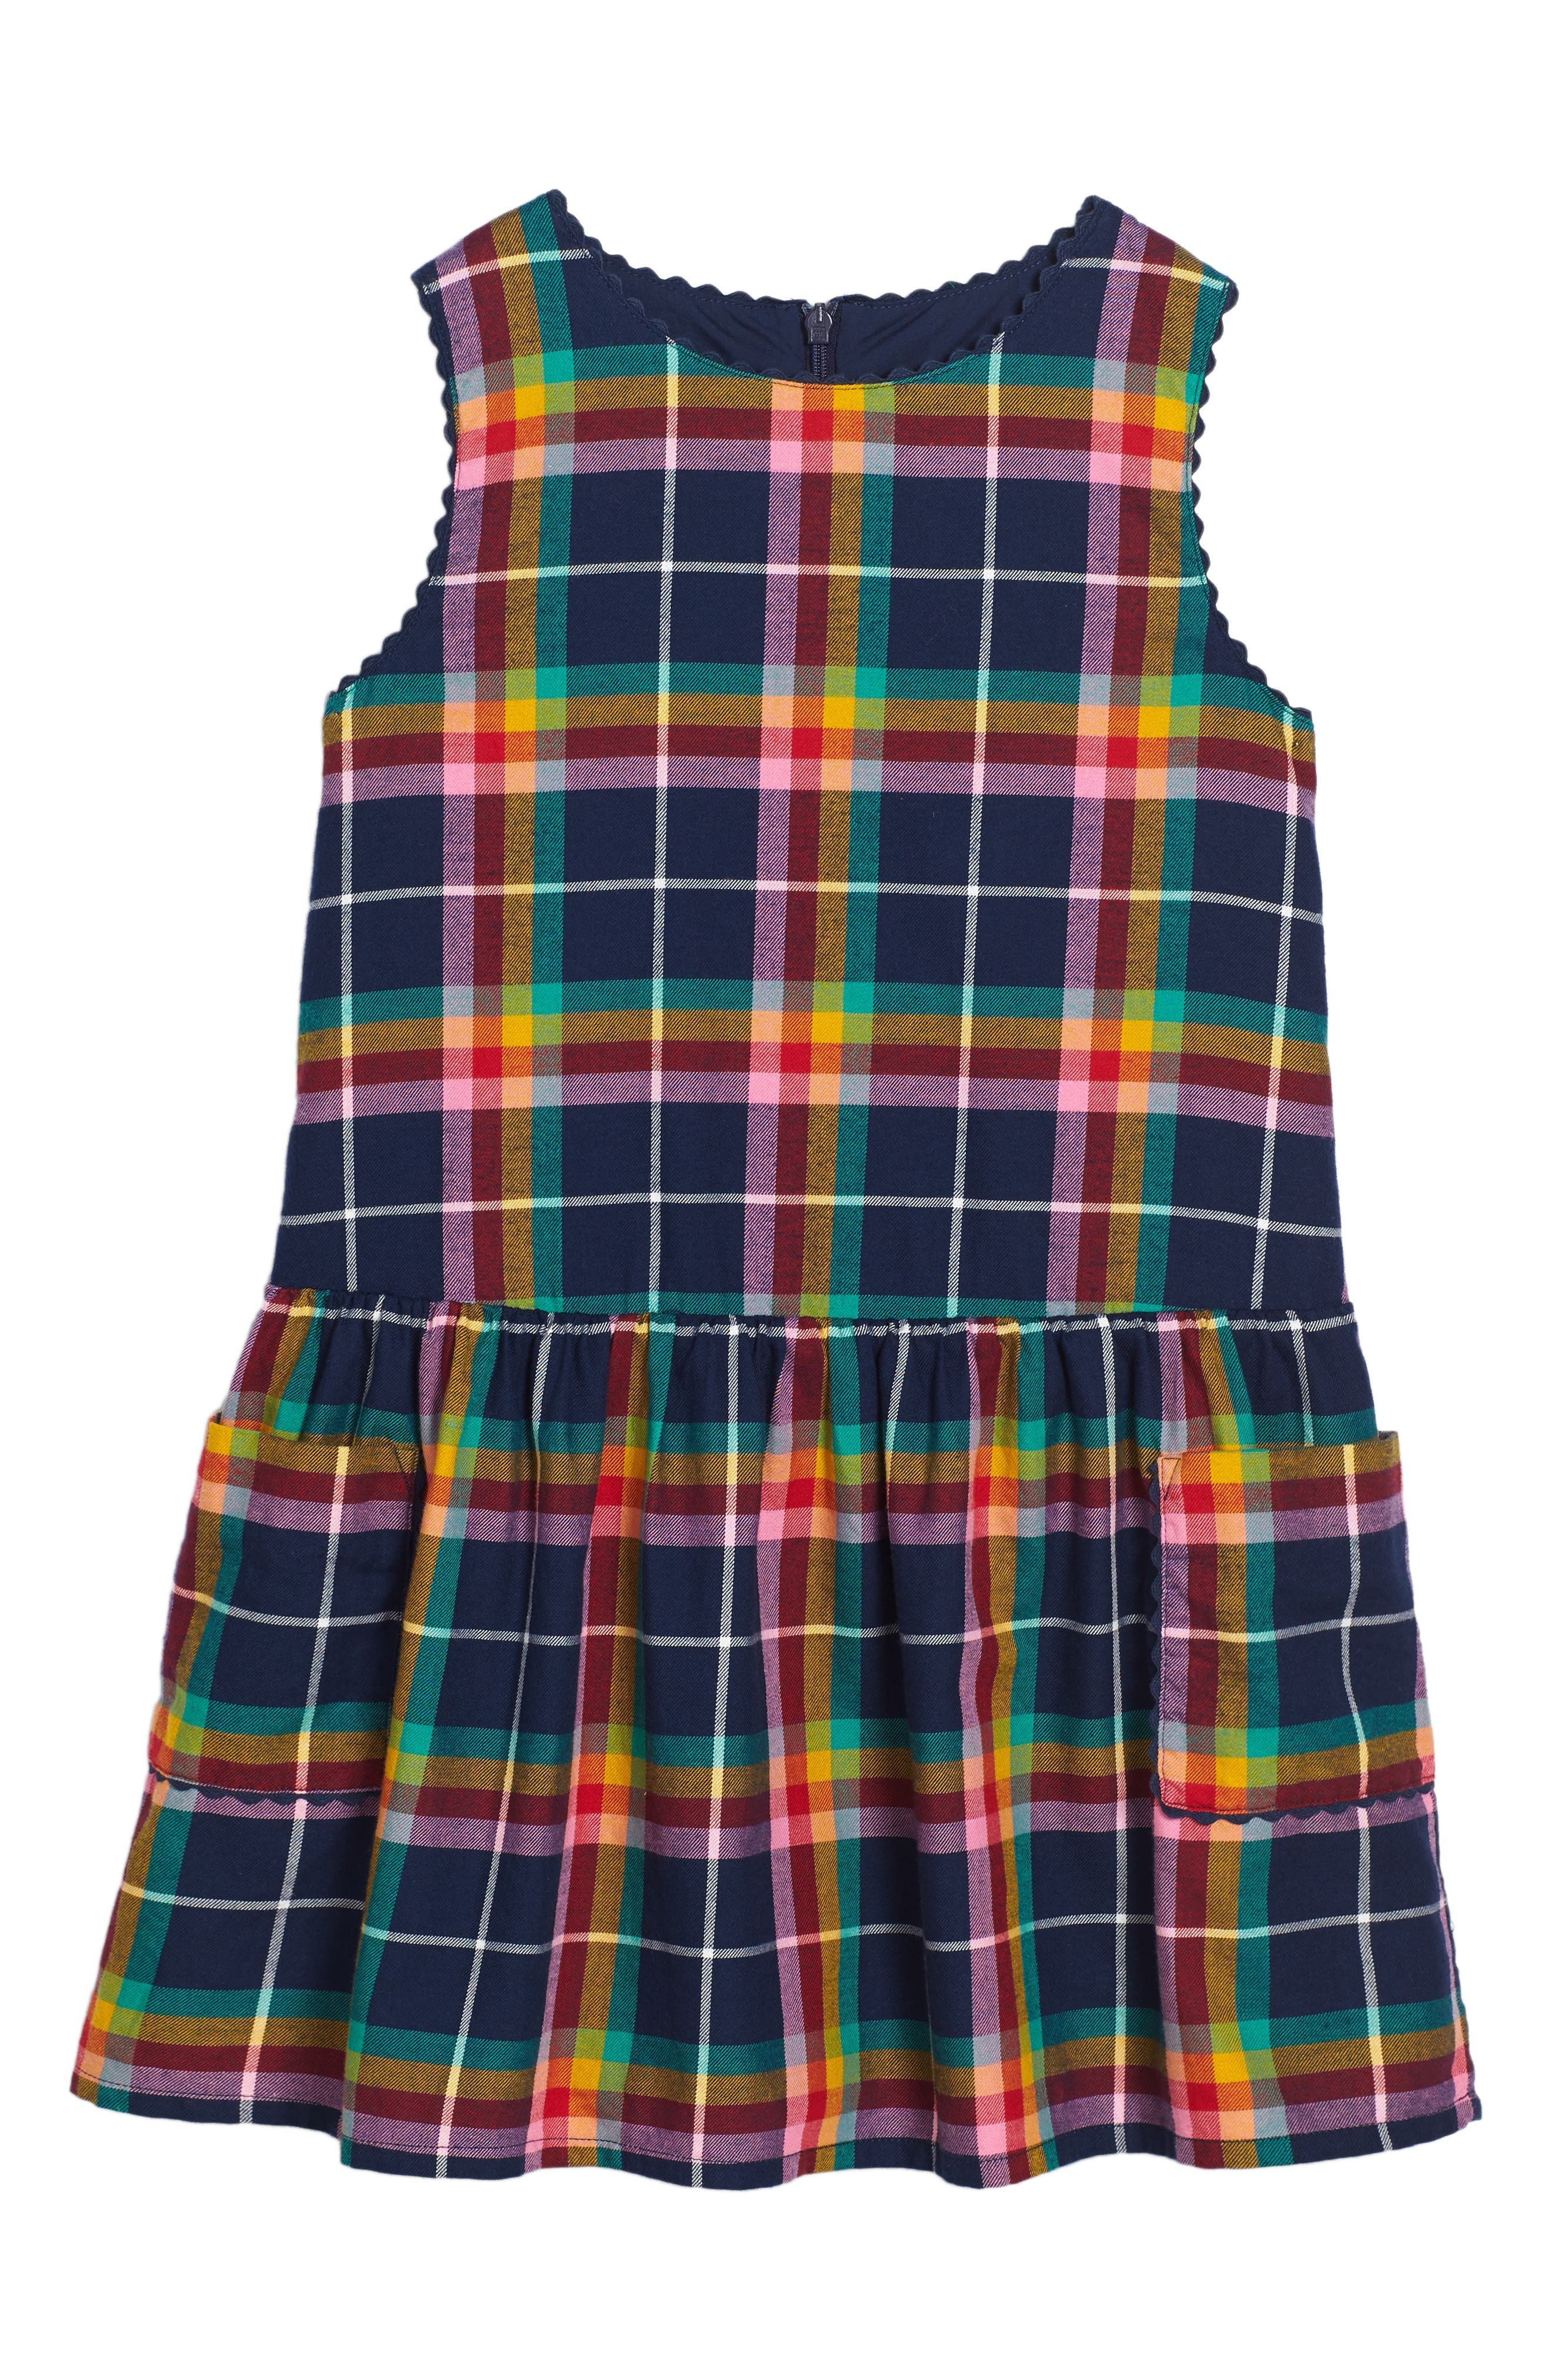 Alternate Image 1 Selected - Mini Boden Plaid Pinafore Dress (Toddler Girls, Little Girls & Big Girls)